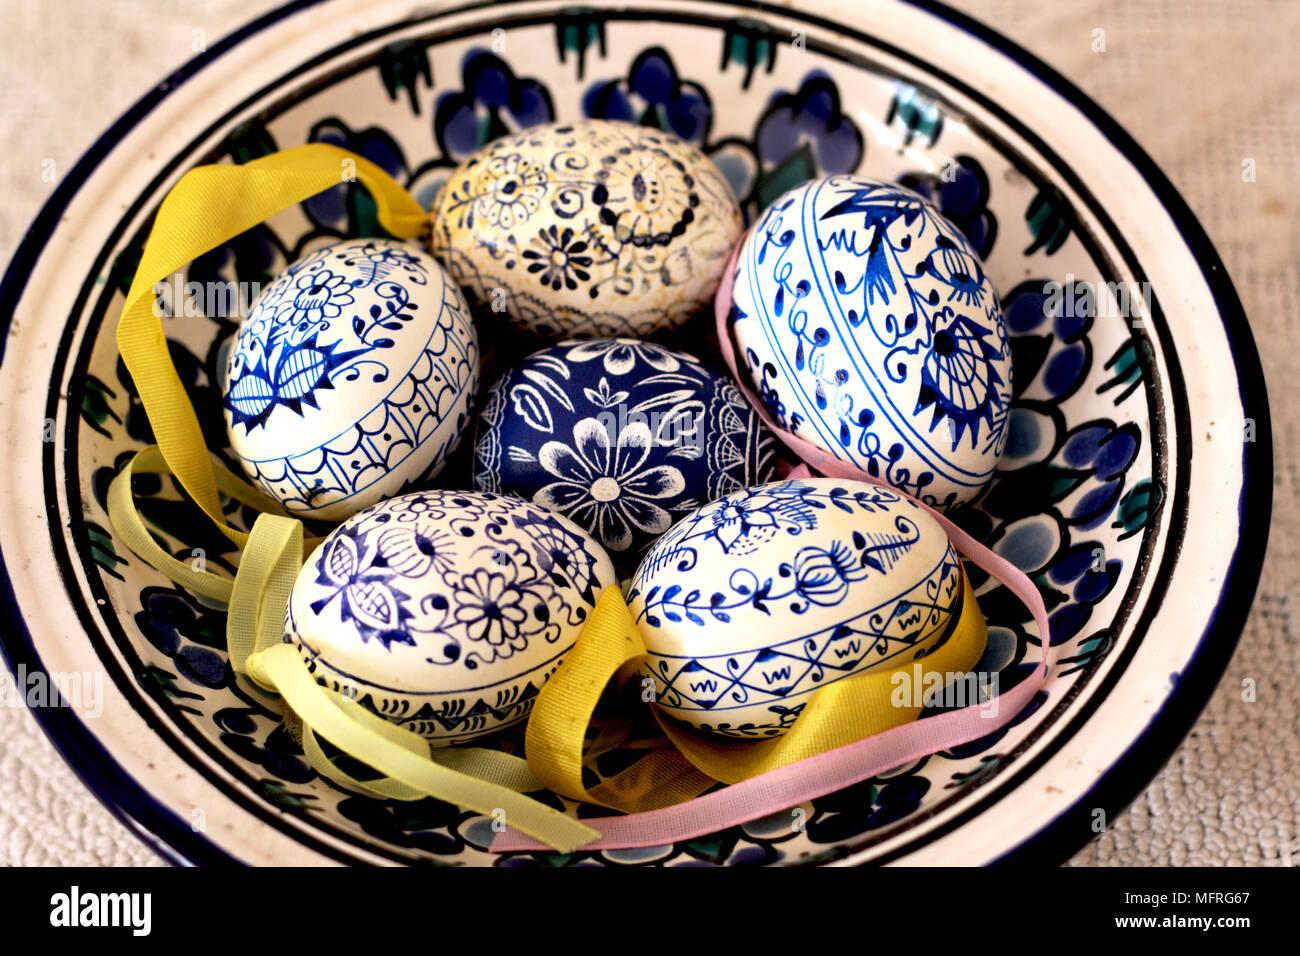 Uova Di Ceramica Dipinte A Mano.Ceca Tradizionale Blu E Bianco Uova Di Pasqua In Un Piatto Blu